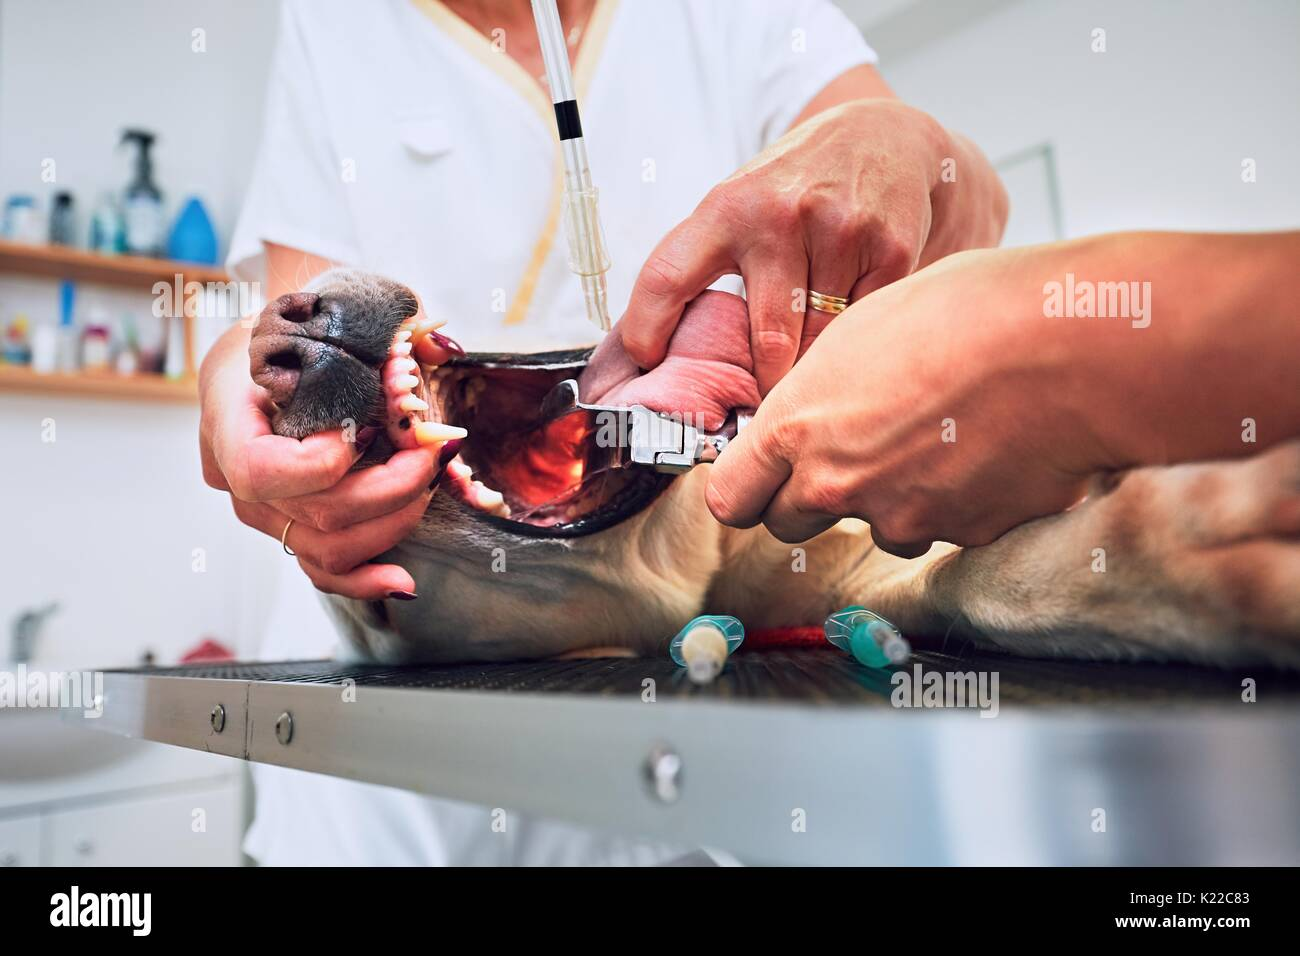 Veterinarian and nurse intubate the diseased dog prior to tumor surgery. Stock Photo